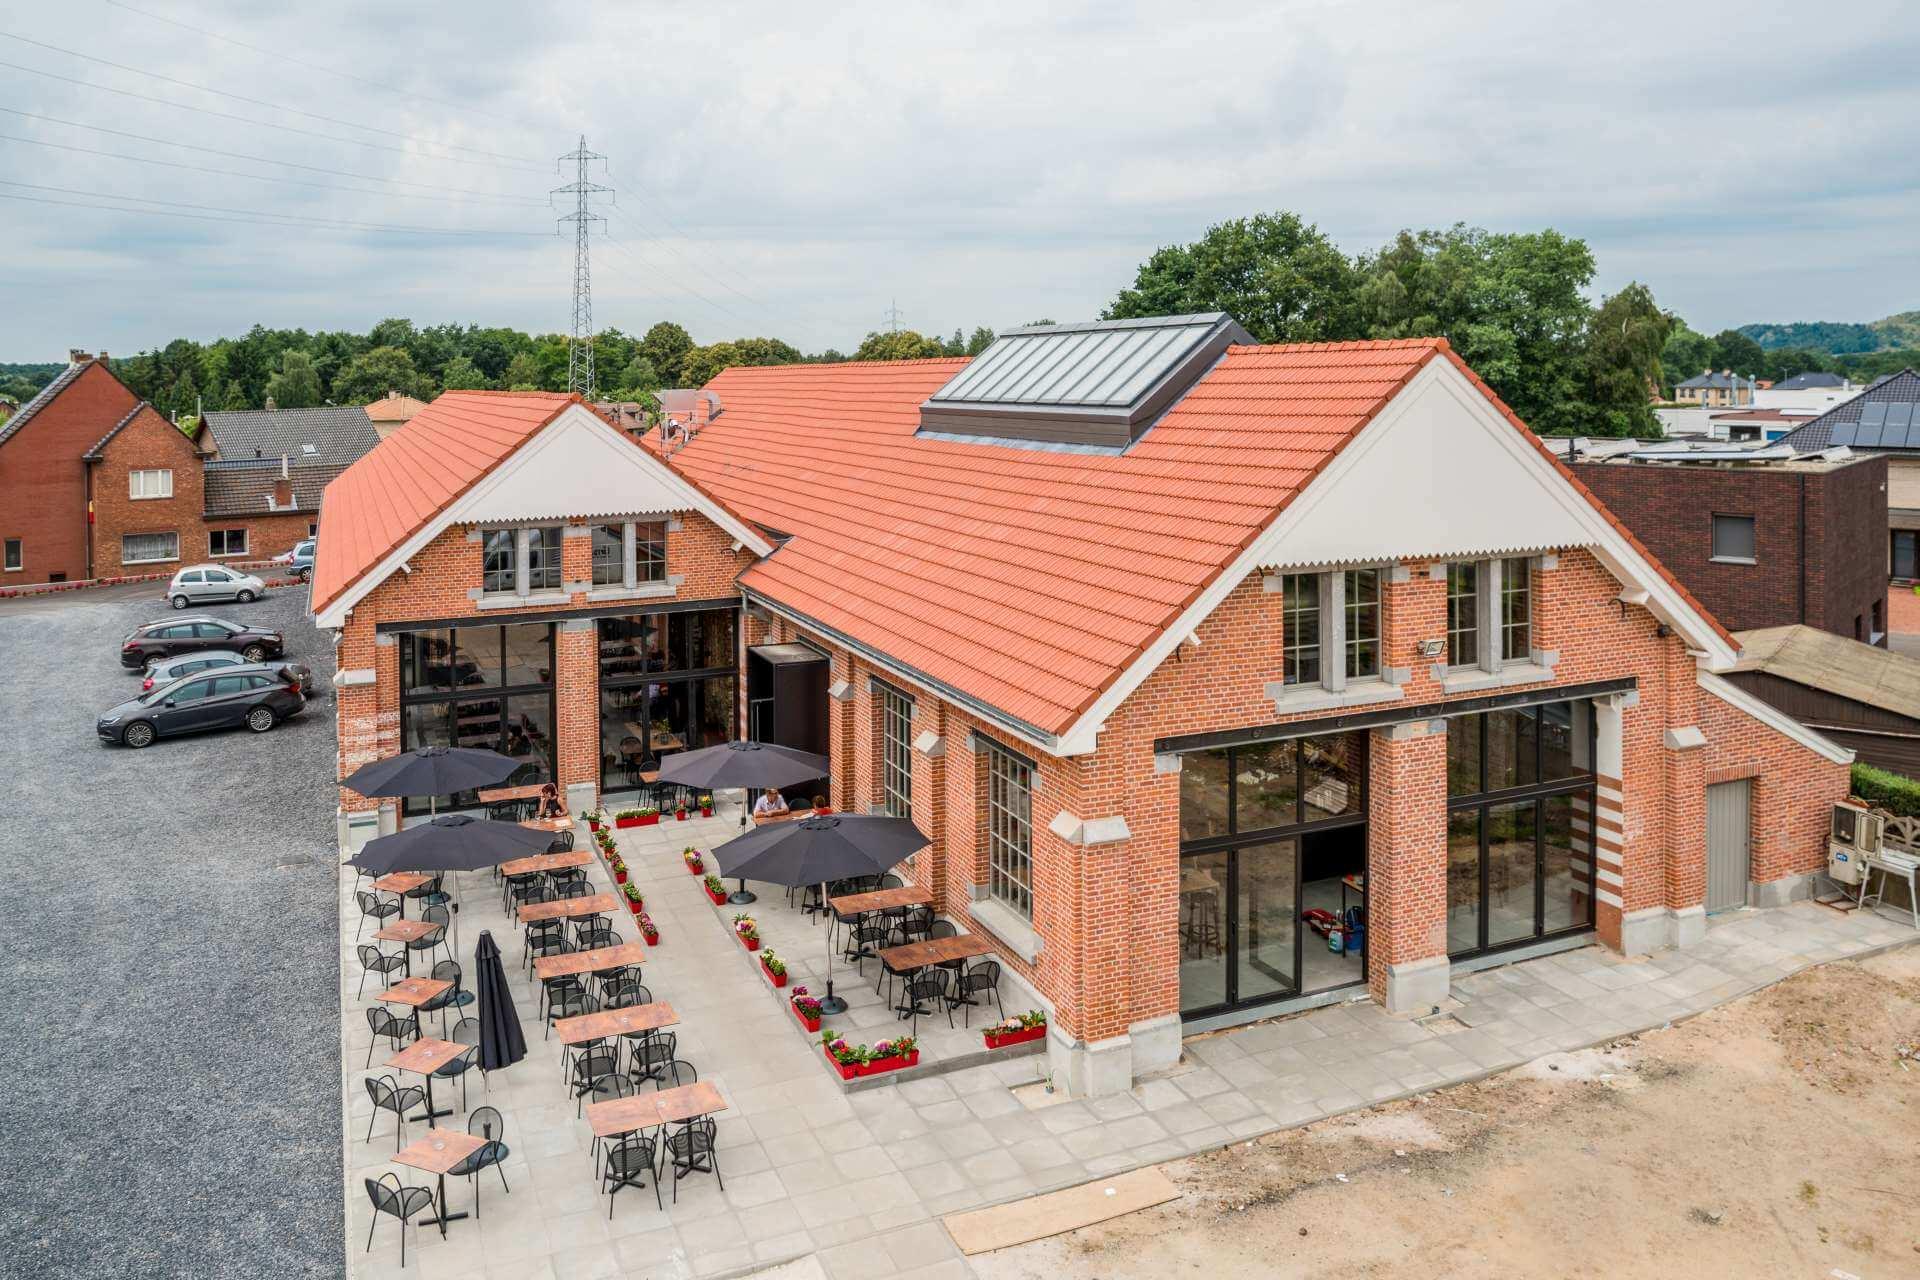 brouwerij-remise-luchtfoto-koersel